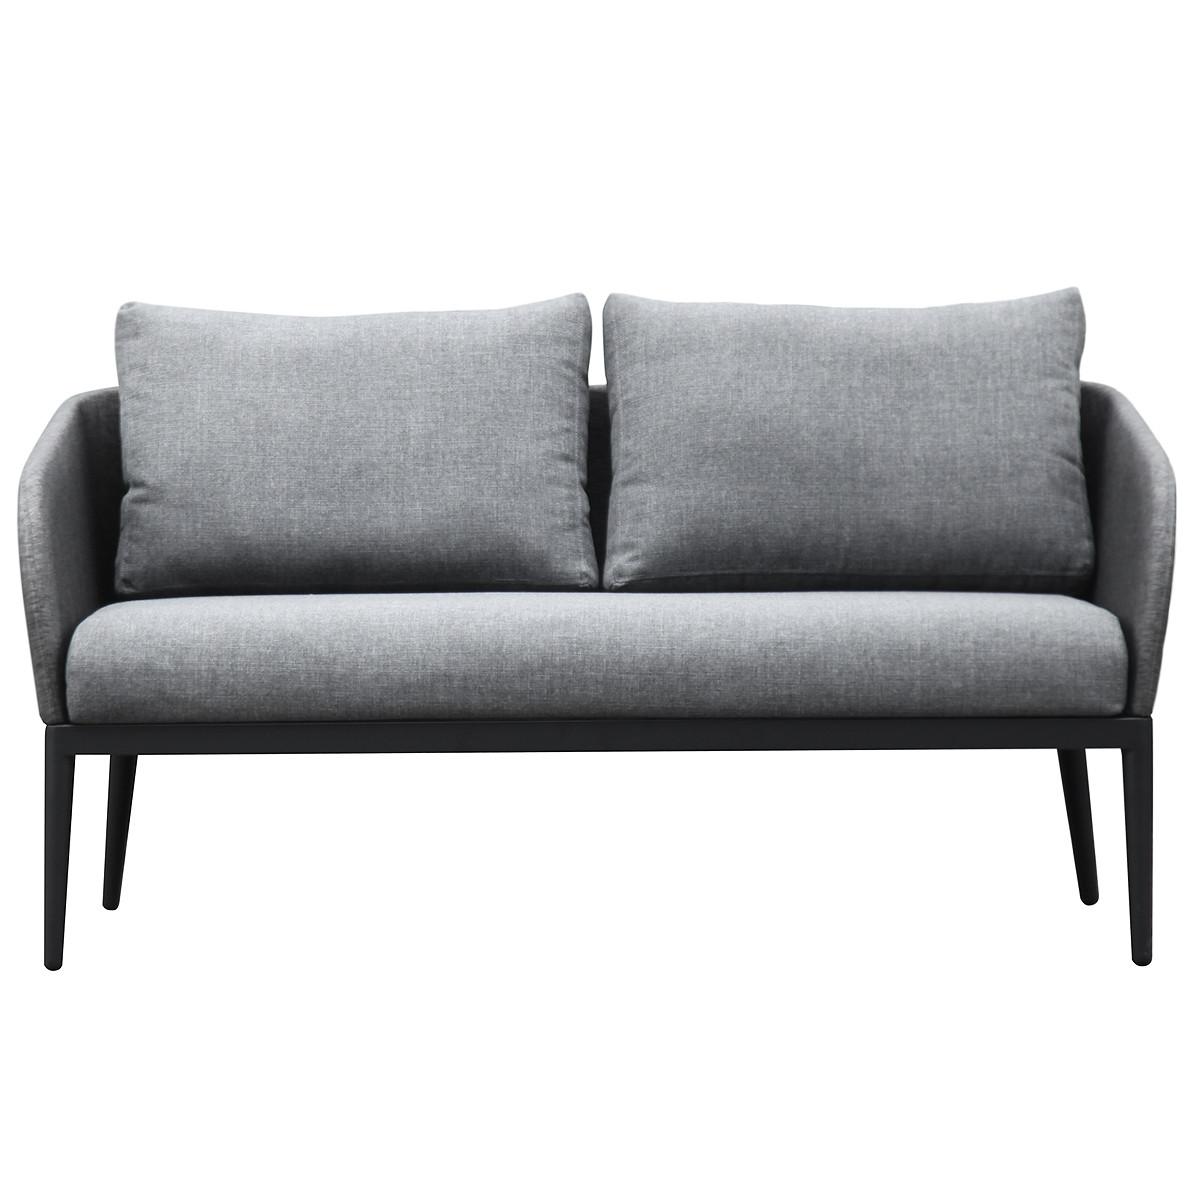 Uphoistery Sofa Loveseat Outdoor Furniture